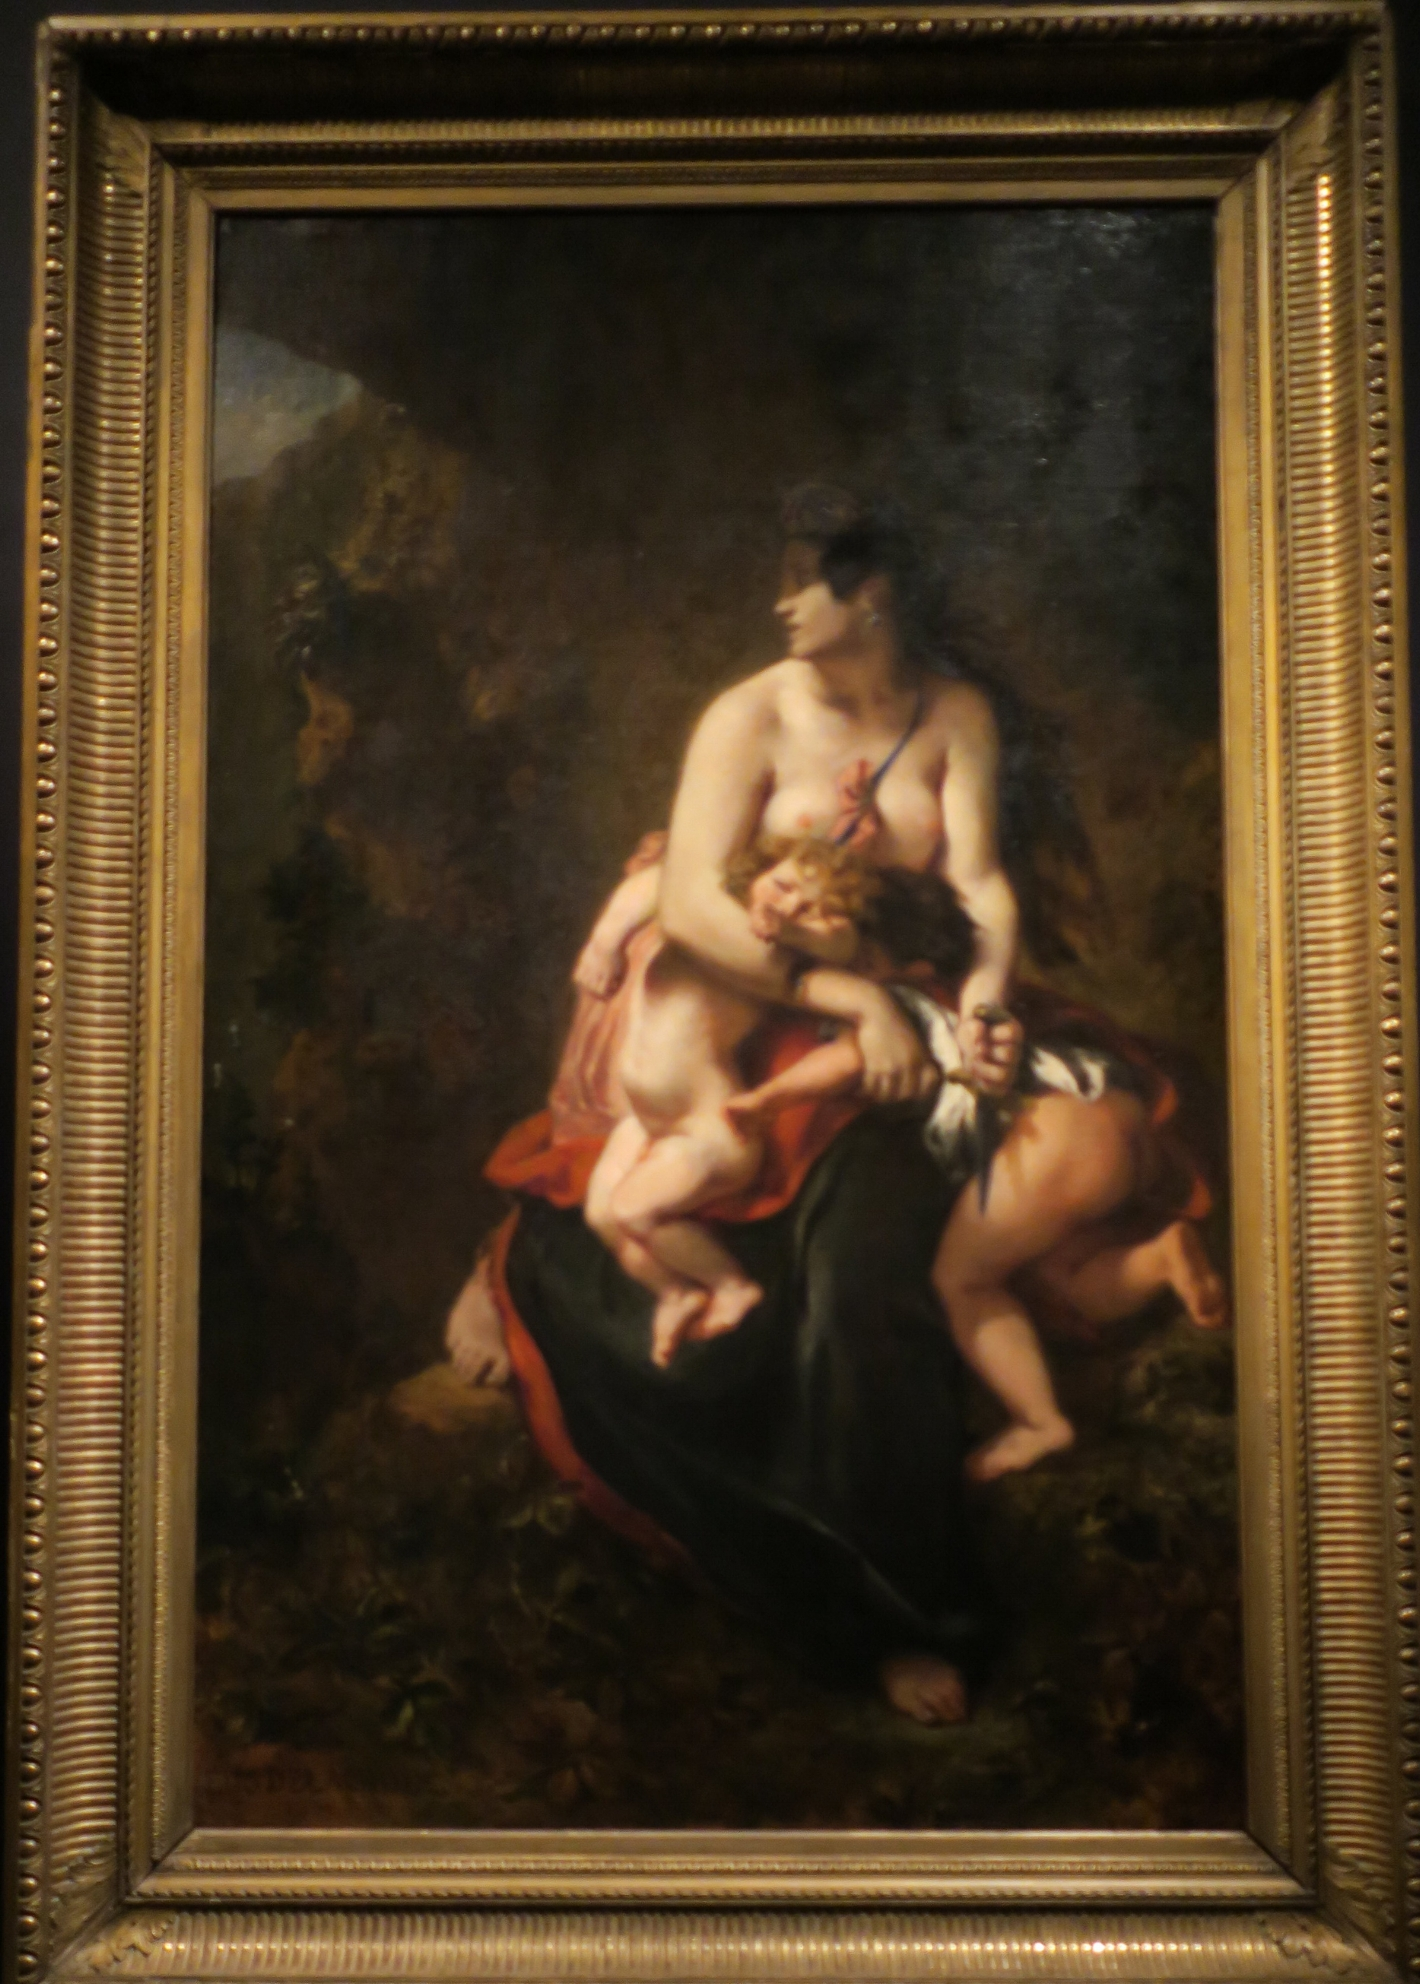 Eugène Delacroix, Medea and her children, 1834